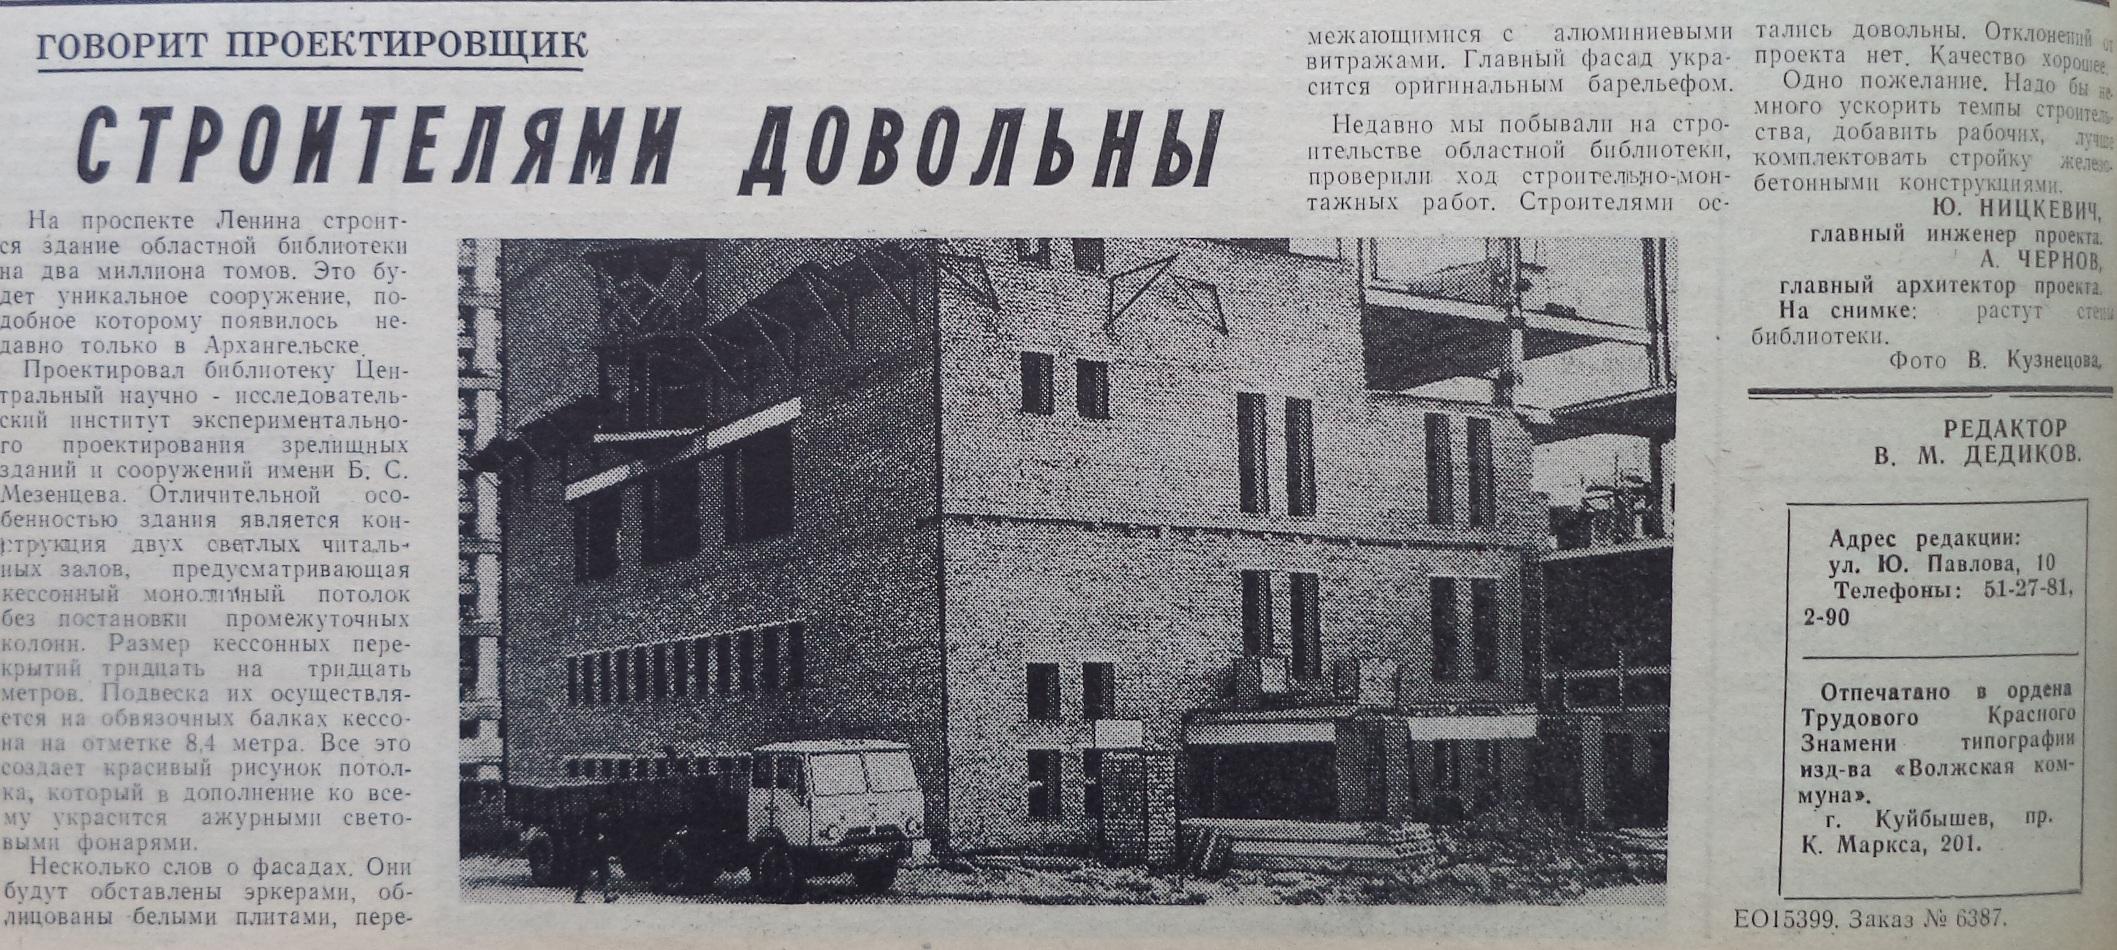 ФОТО-36-Ленина-Трибуна Строителя-1982-2 декабря